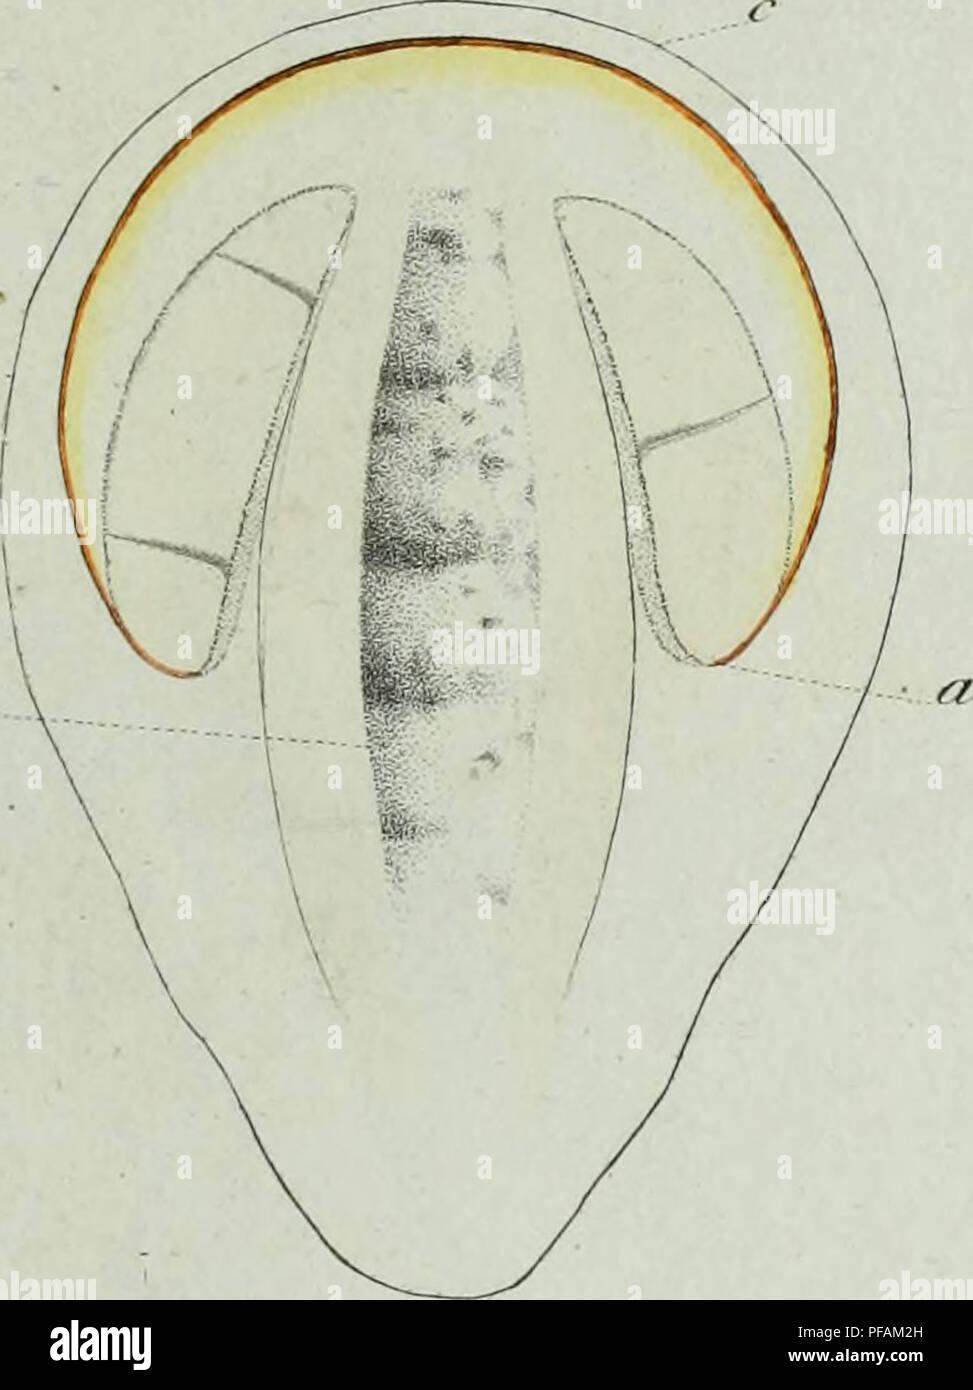 . Descrizione dei funghi mangerecci più comuni dell'Italia e de' velenosi che possono co' medesimi confondersi. Fungi; Mushrooms. F?</.f. 'â : .' fì^/7.. féÃL I&.//Z. Please note that these images are extracted from scanned page images that may have been digitally enhanced for readability - coloration and appearance of these illustrations may not perfectly resemble the original work.. Vittadini, Carlo; Cavagna Sangiuliani di Gualdana, Antonio, conte, 1843-1913, former owner. IU-R. Milano, Rusconi - Stock Image